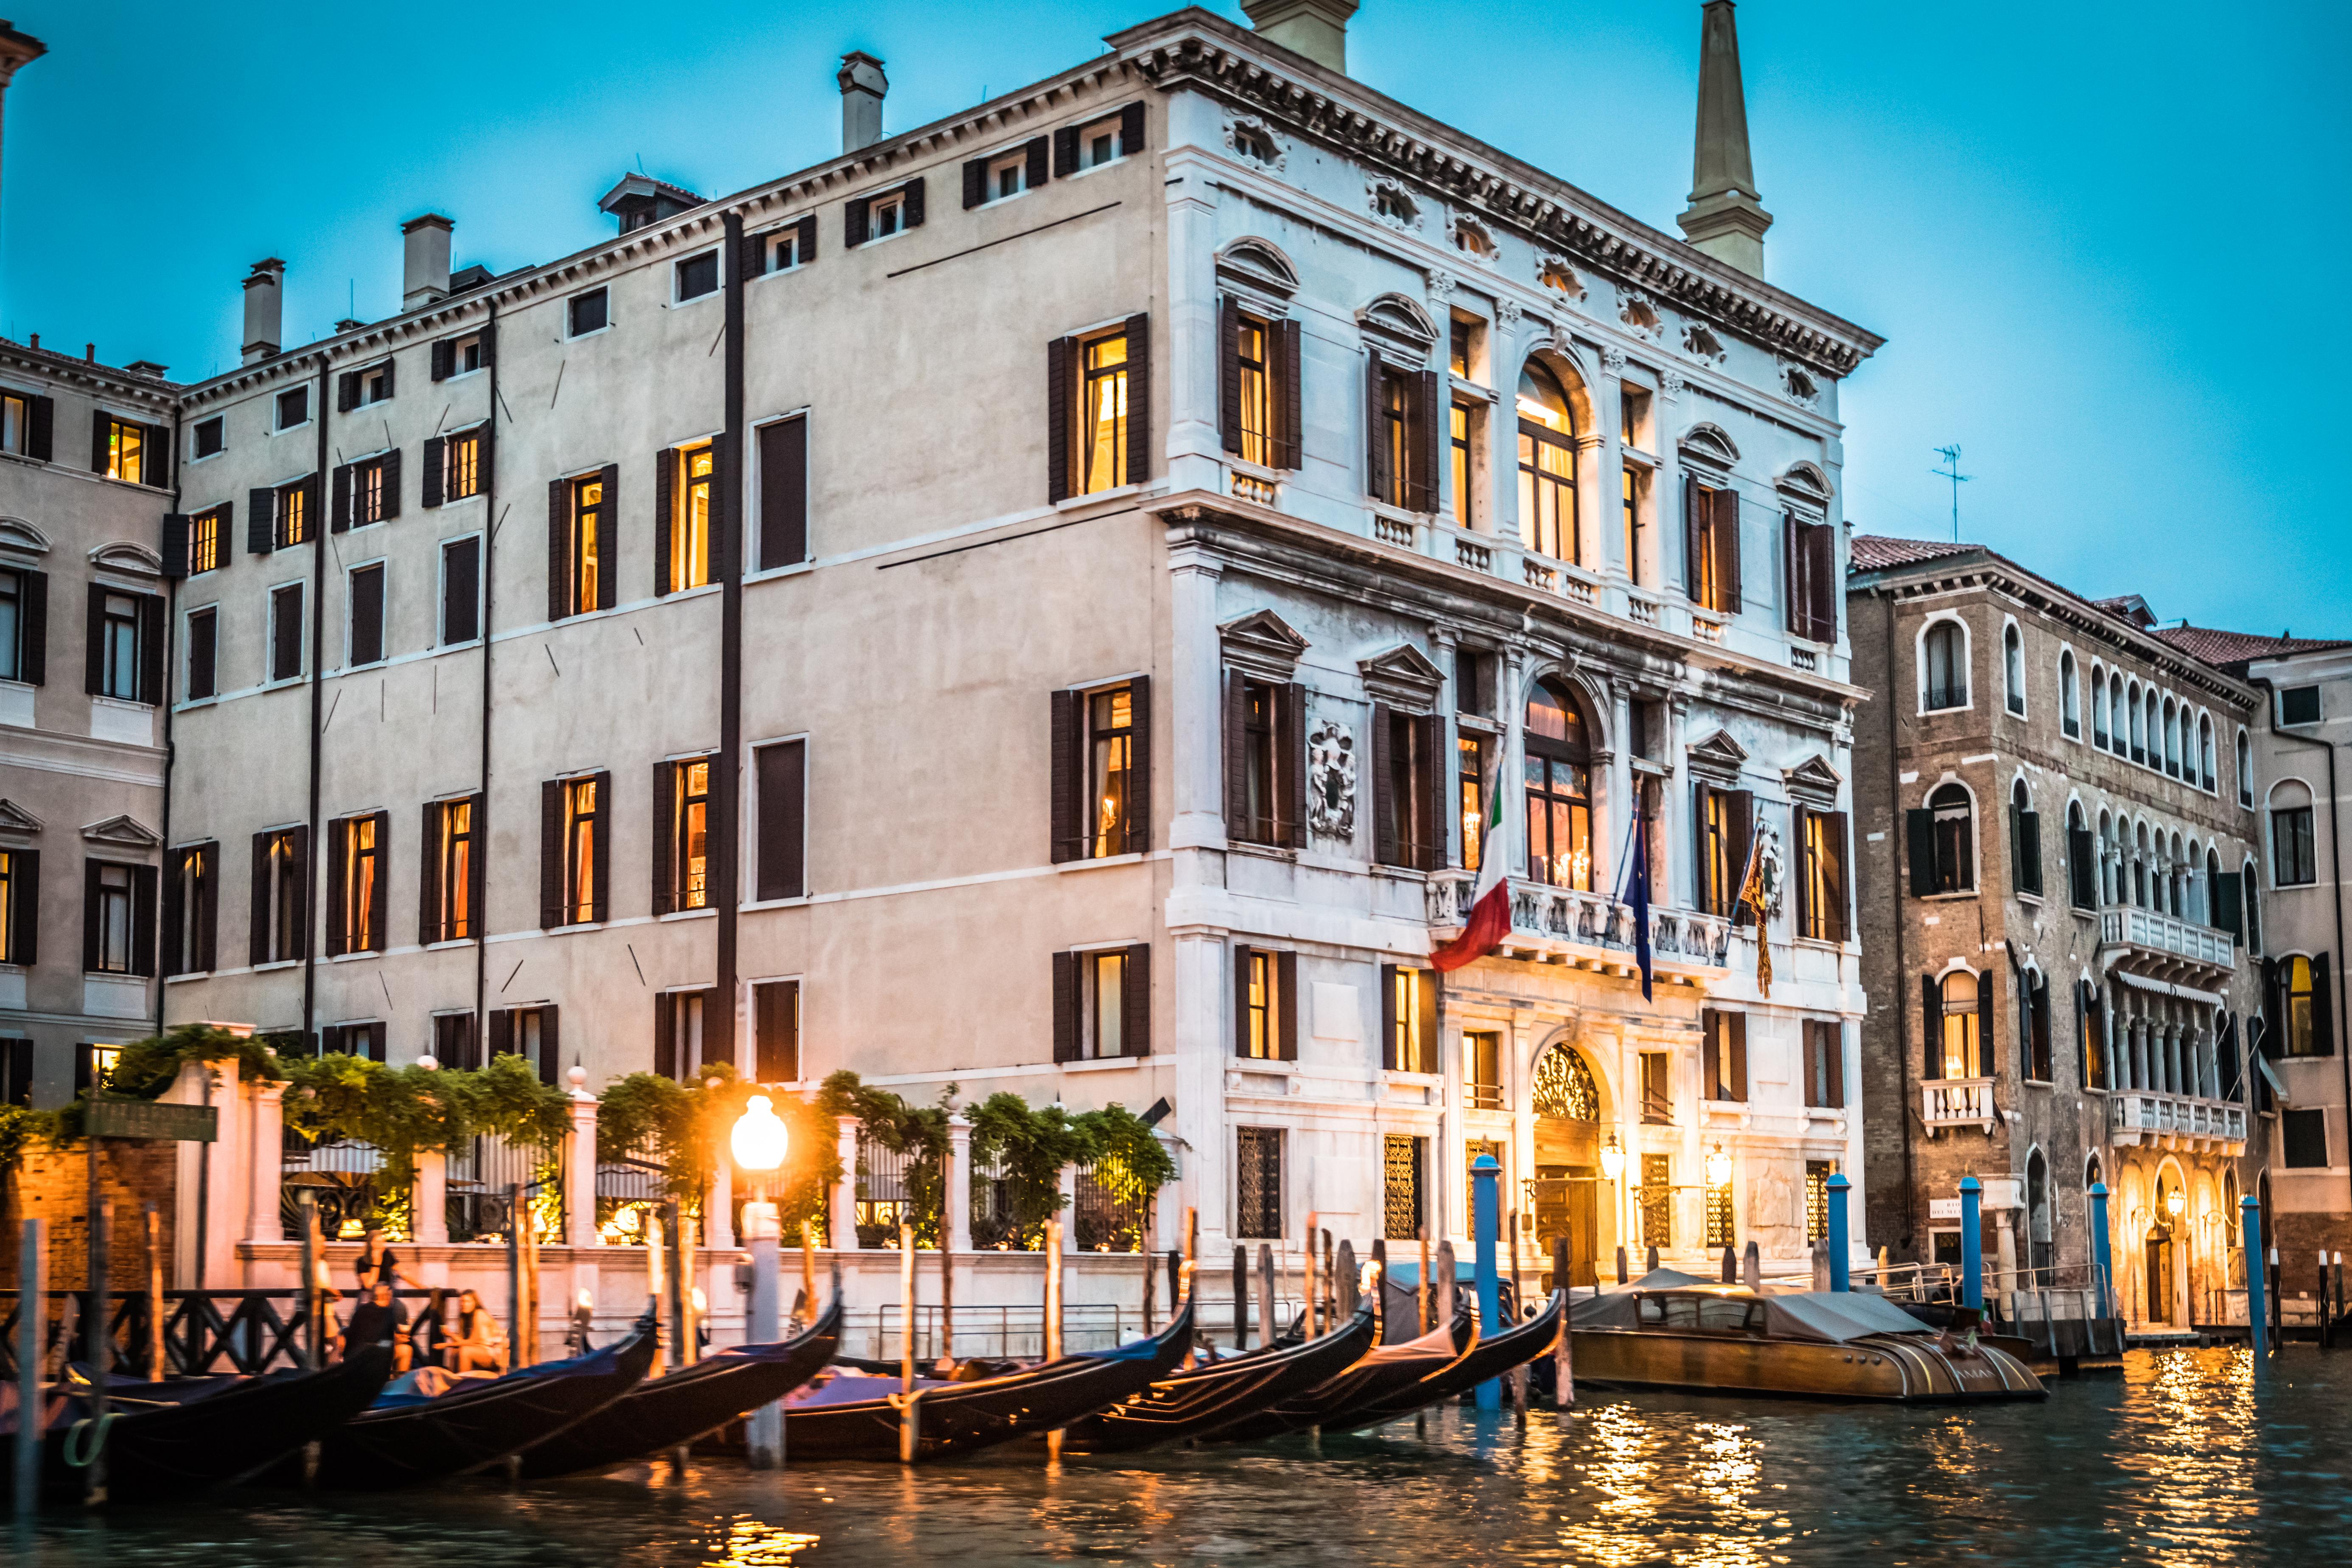 aman-venice-italy-grand-canal-palazzo-papadopoli-palace